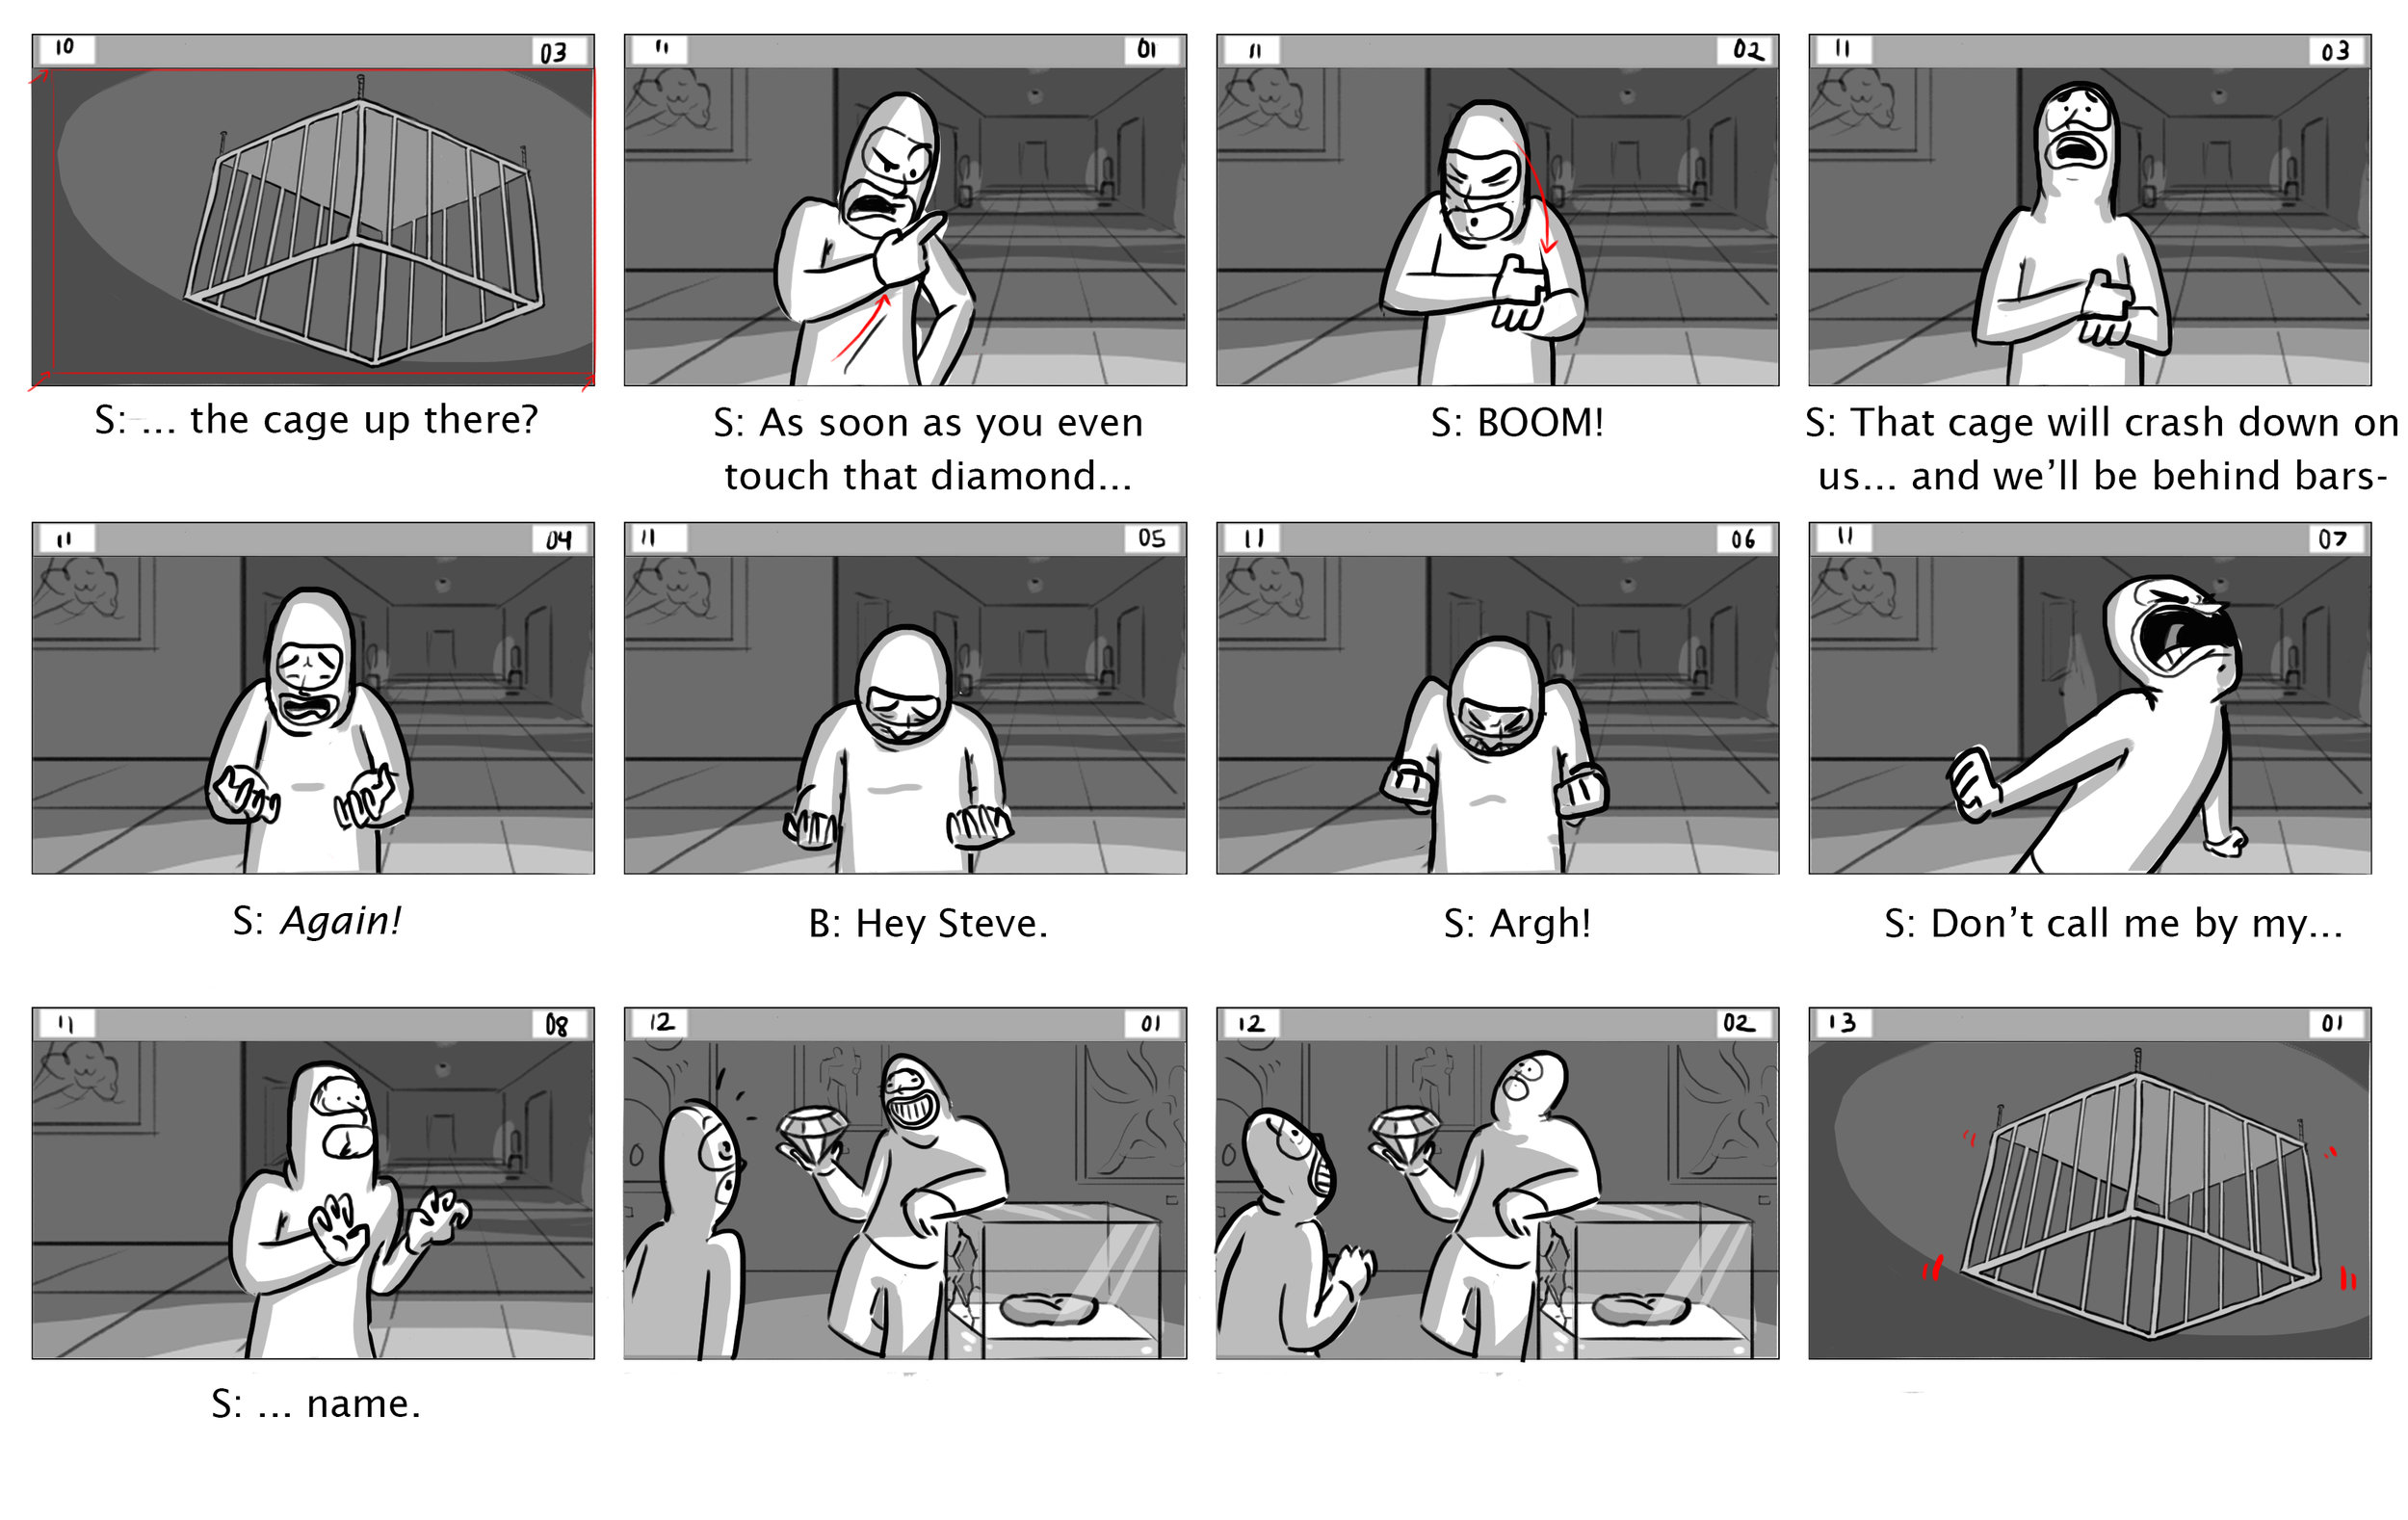 GrantWhitsitt_Final_Storyboard_page5.jpg